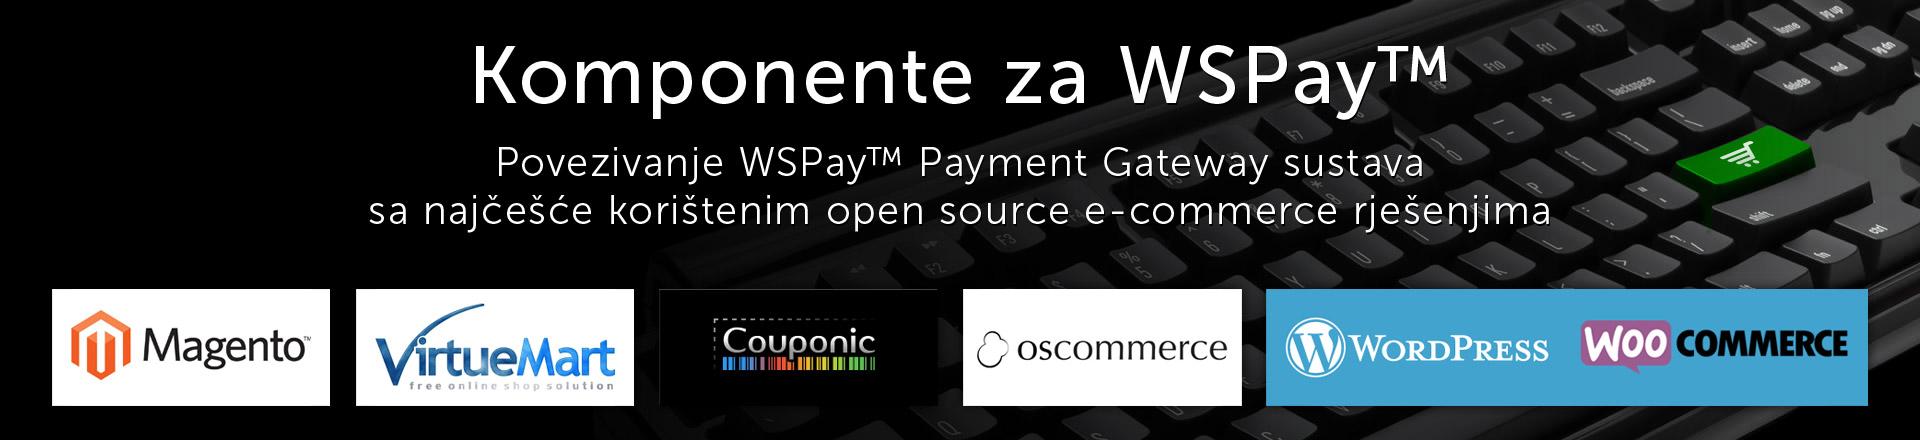 https://www.wspay.info/Repository/Banners/wsPayKomponente-1920x440.jpg